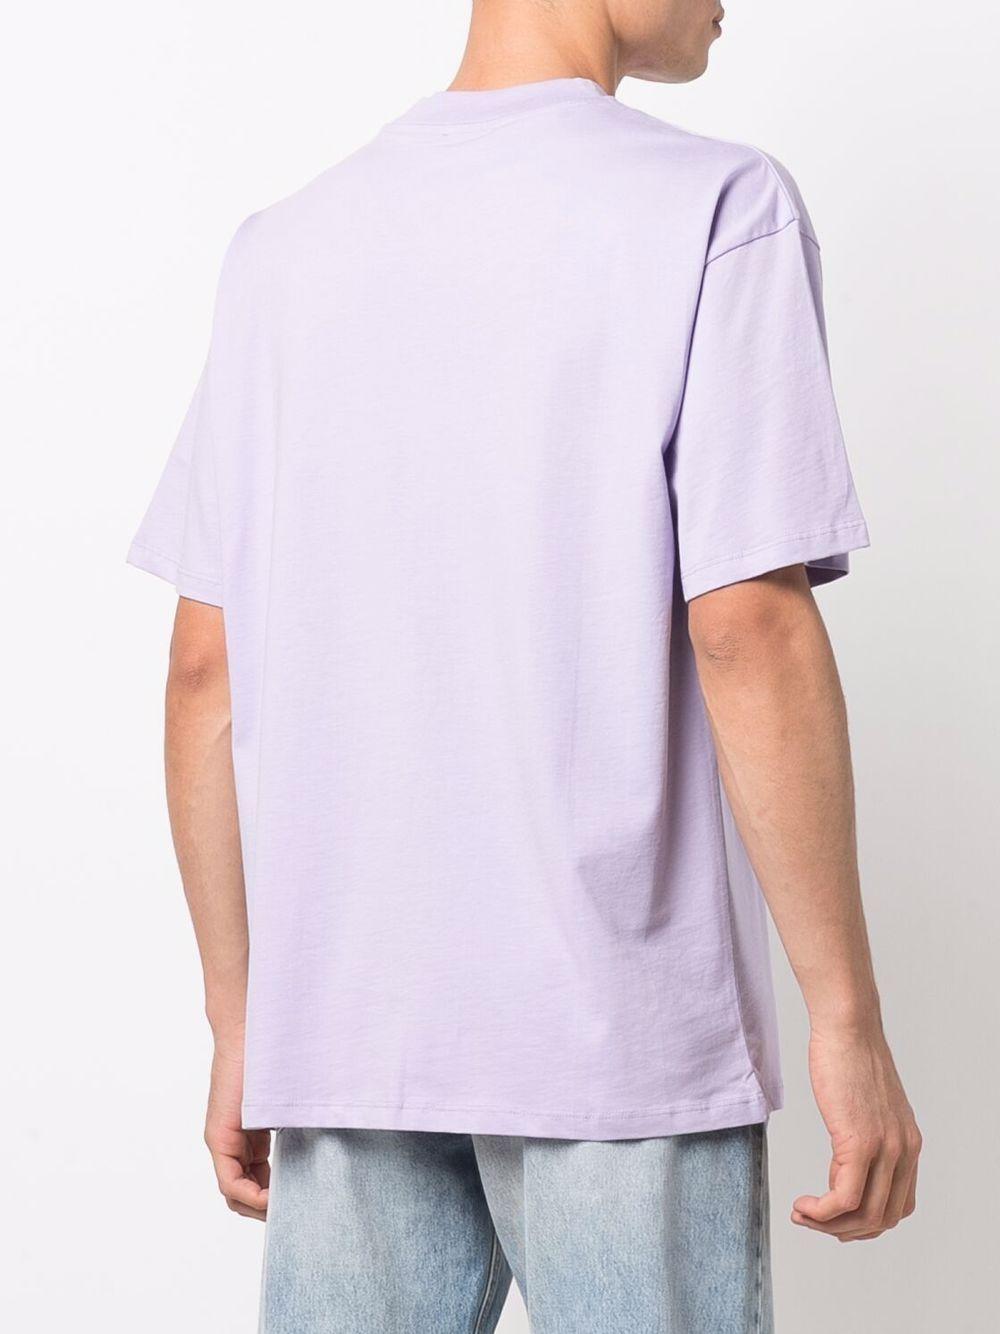 slogan t-shirt unisex liliac in cotton HONEY FUCKING DIJON | T-shirts | HFD04T0031